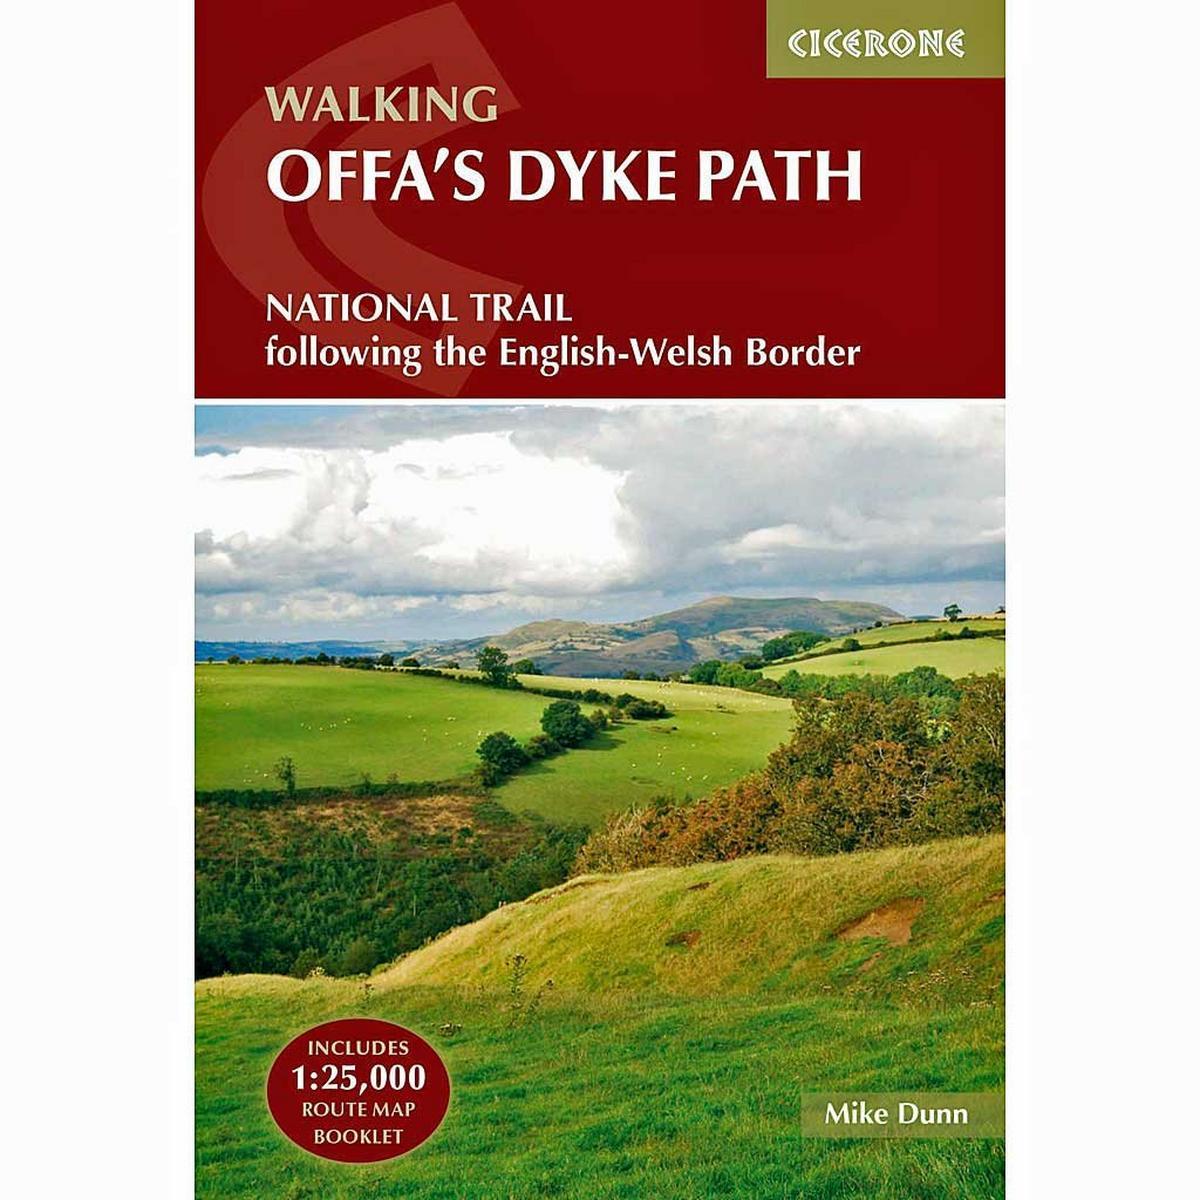 Cicerone Walking Guide Book: Offa's Dyke Path